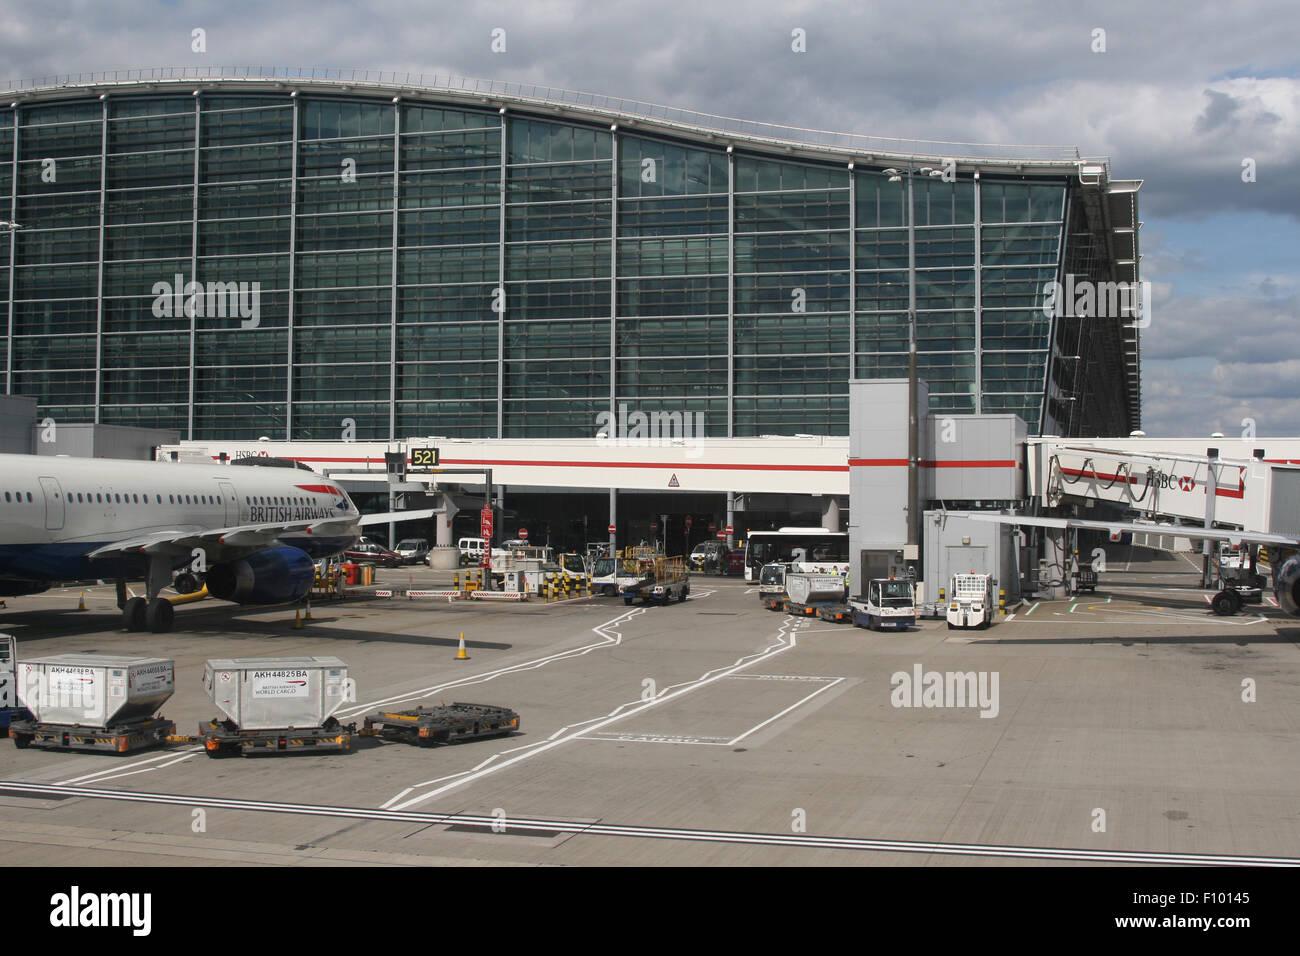 BA BRITISH AIRWAYS IAG TERMINAL 5 HEATHROW - Stock Image